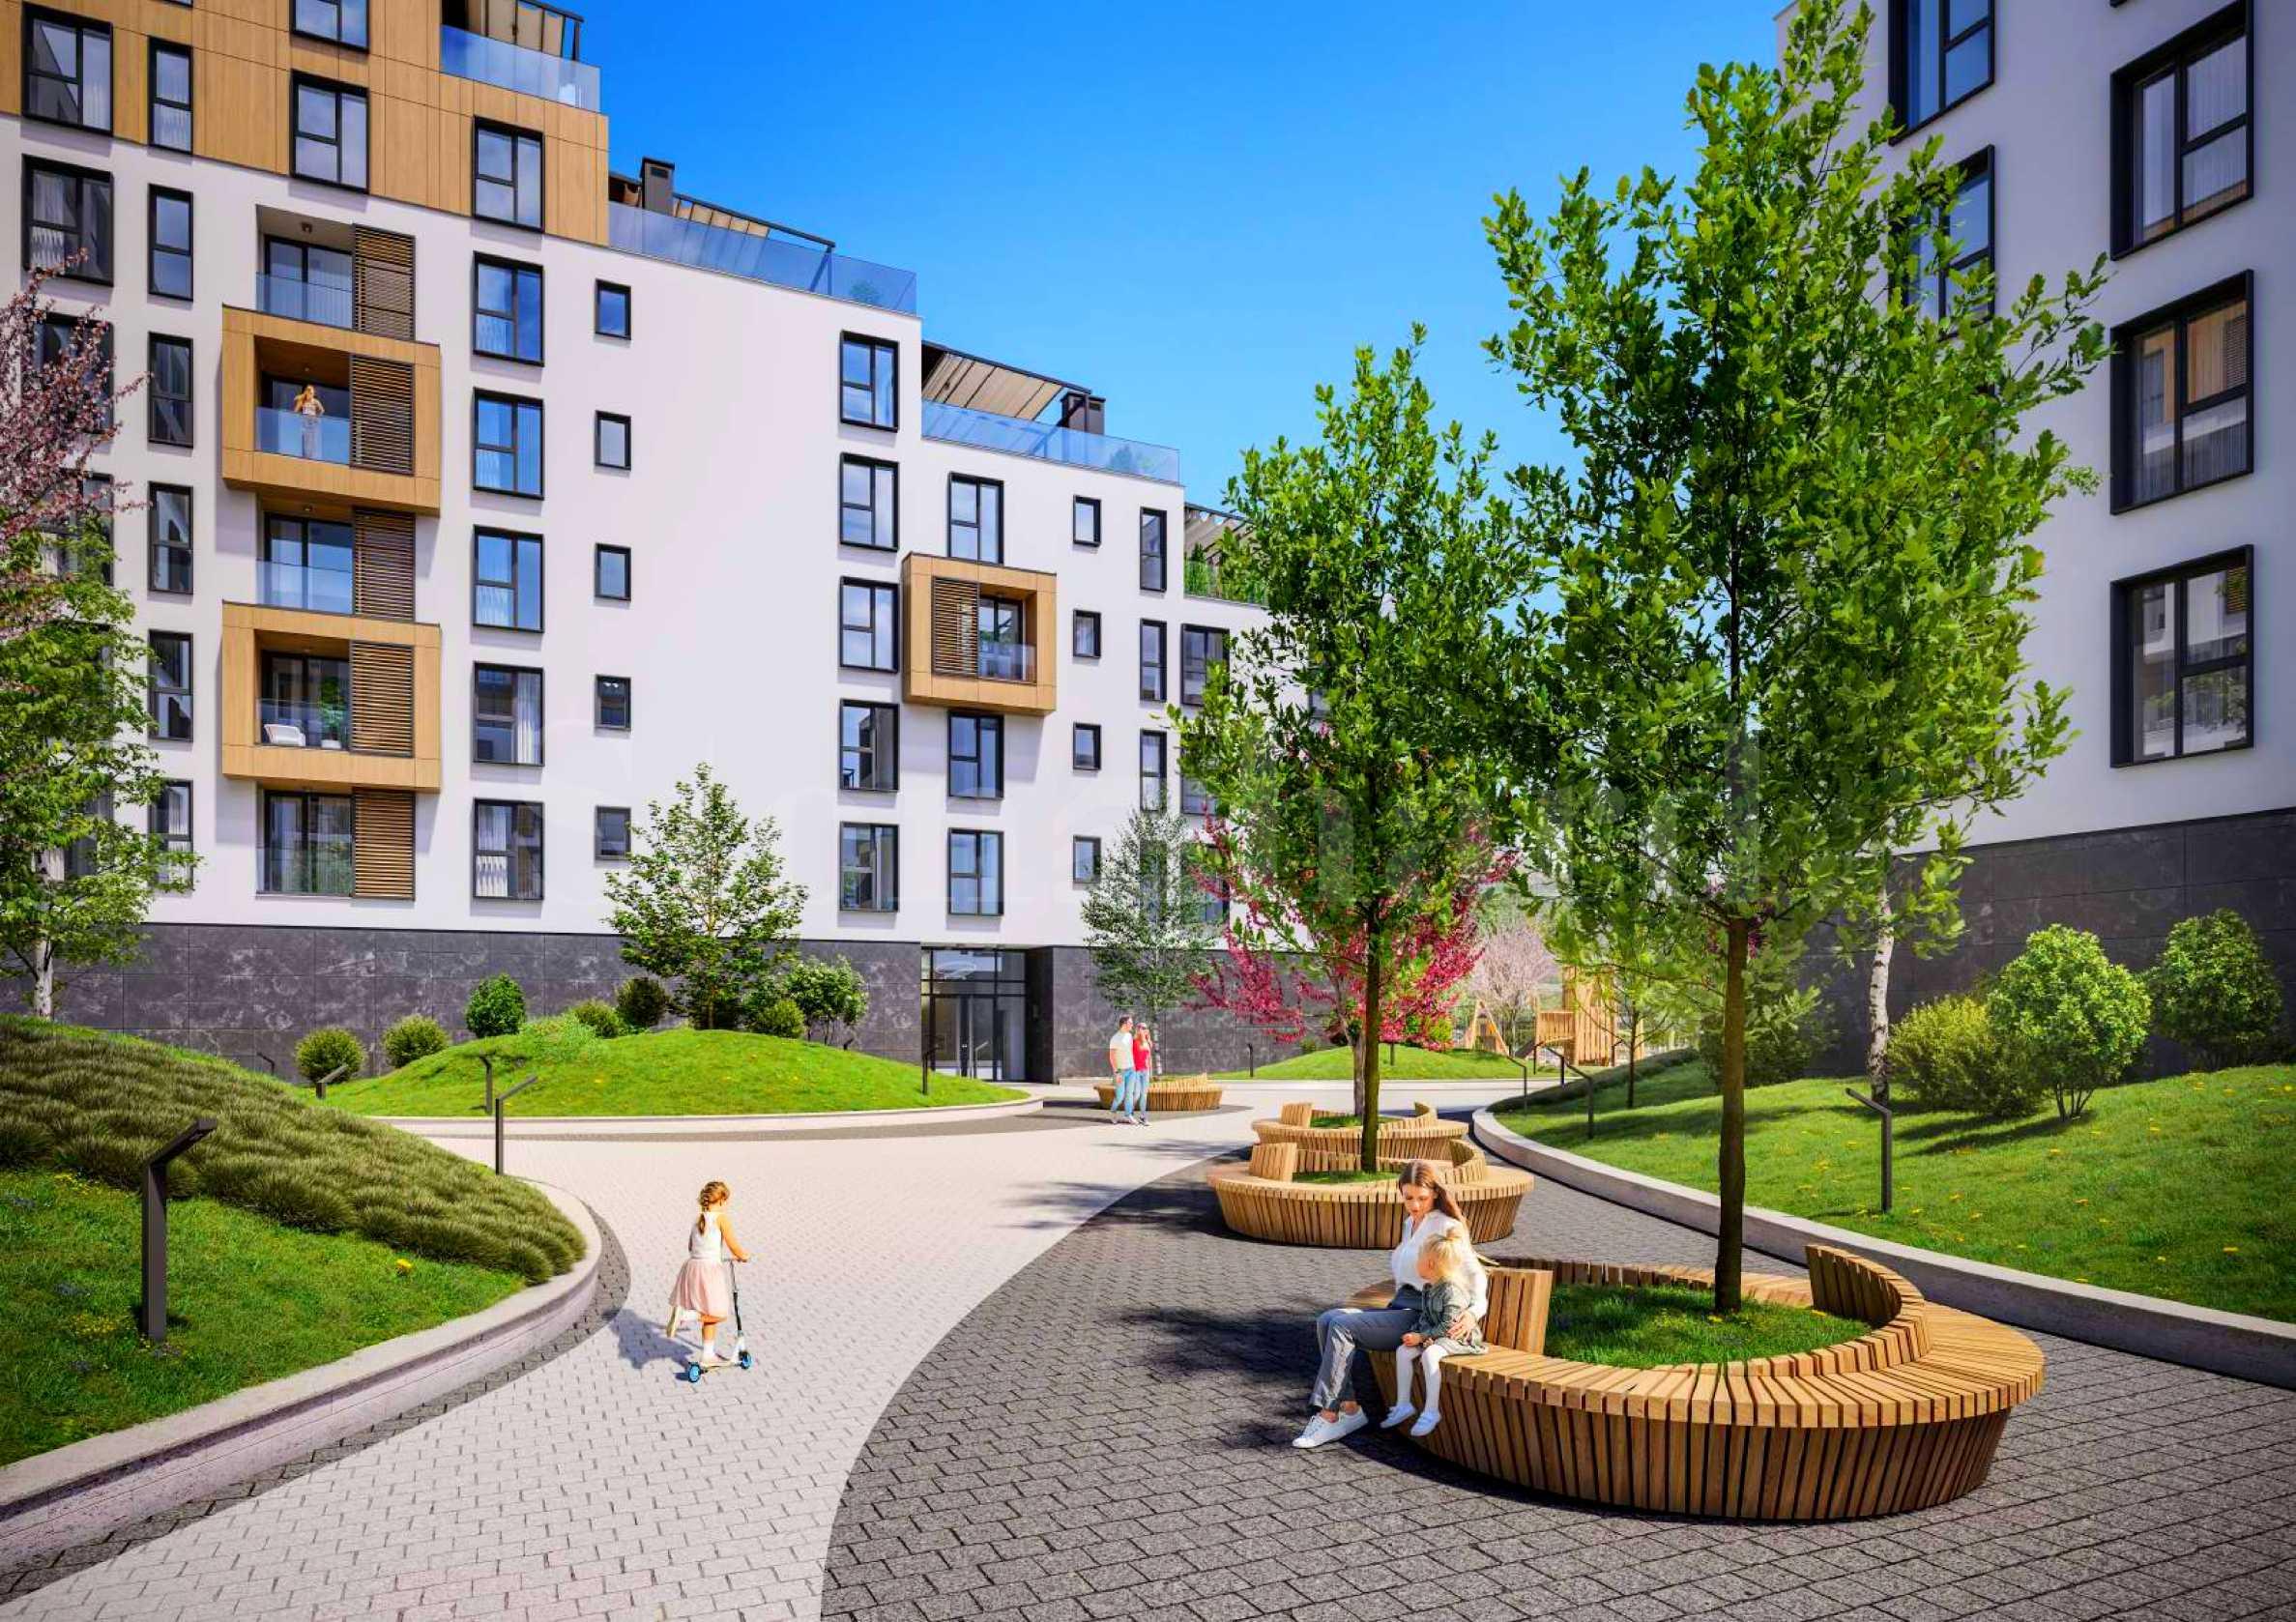 Нови апартаменти в популярен комплекс до Mall Plovdiv и парк Отдих и култура1 - Stonehard